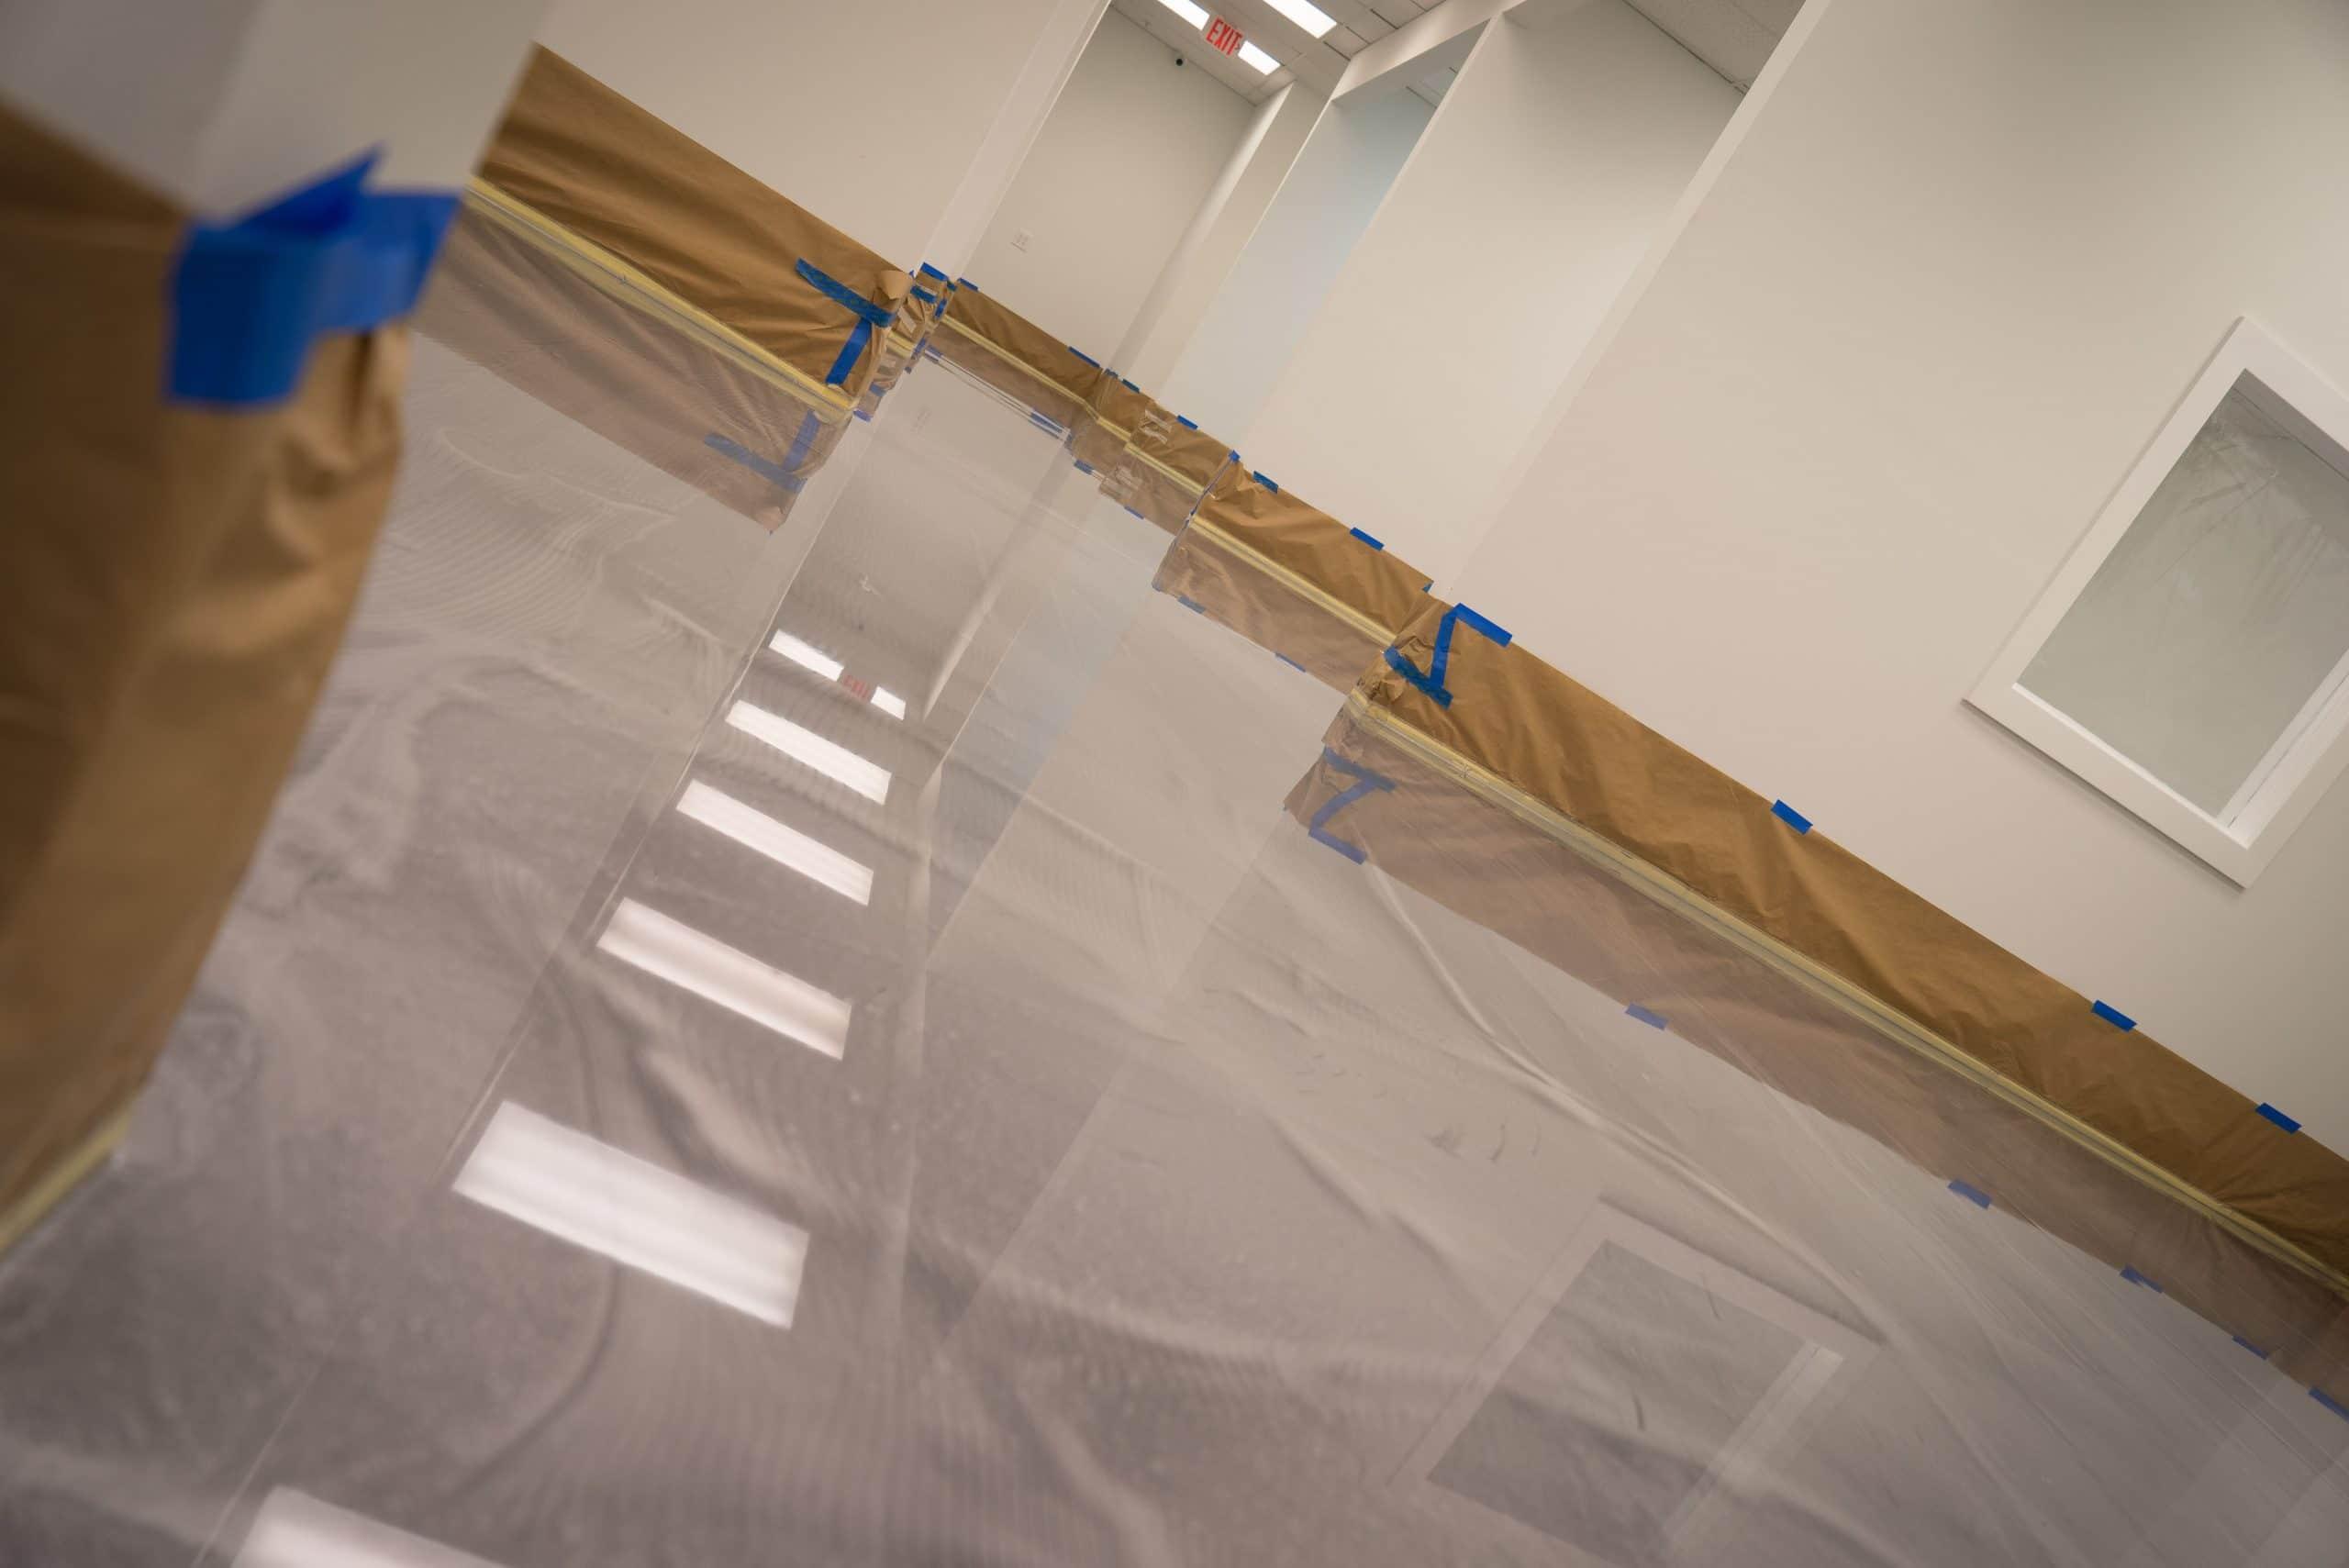 Silver Metallic Epoxy Flooring system